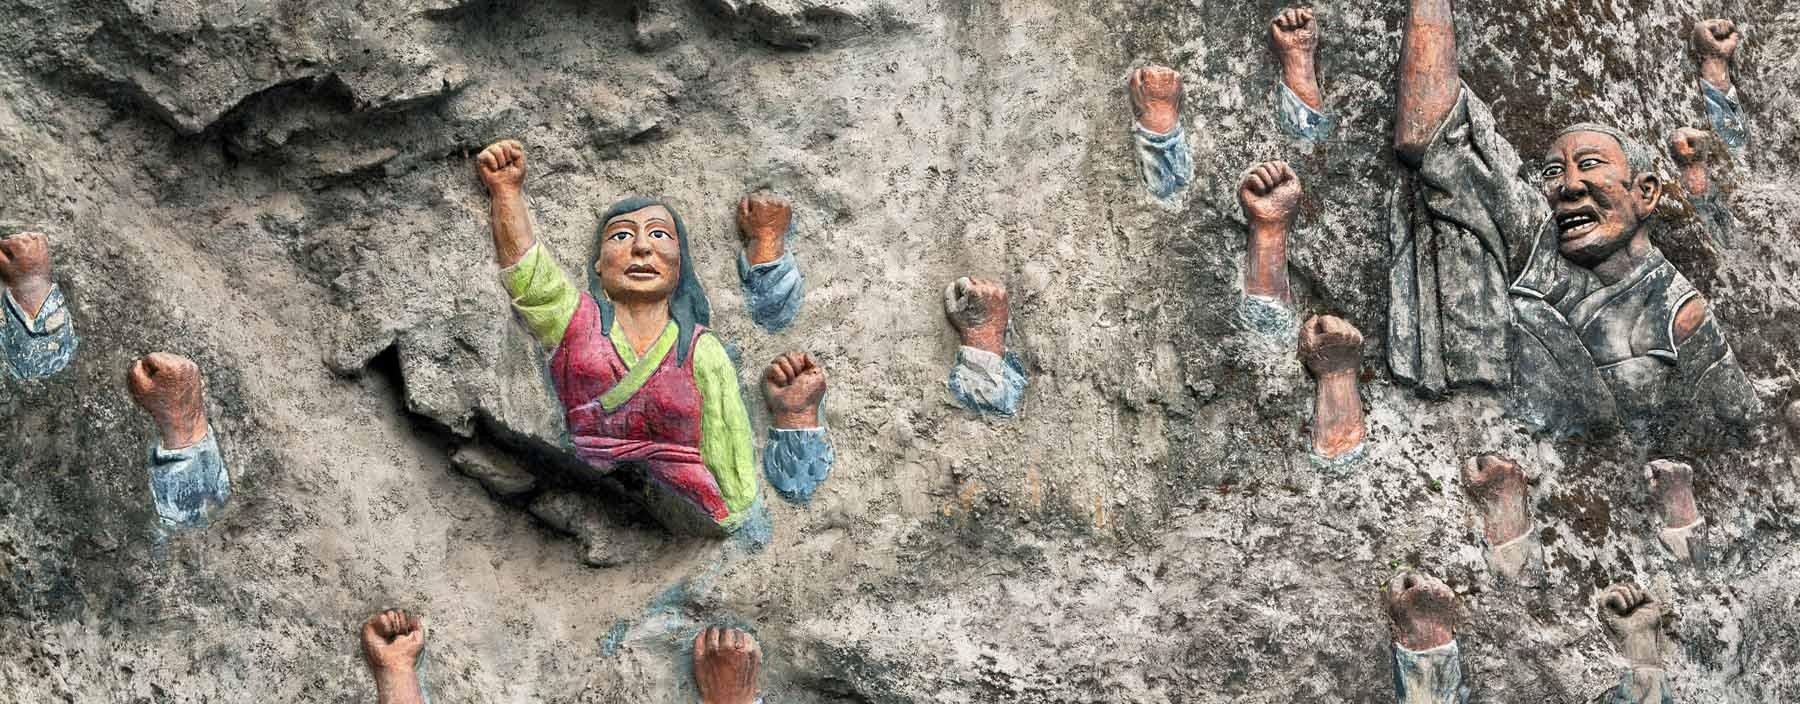 in, dharamsala, martelarenmonument.jpg